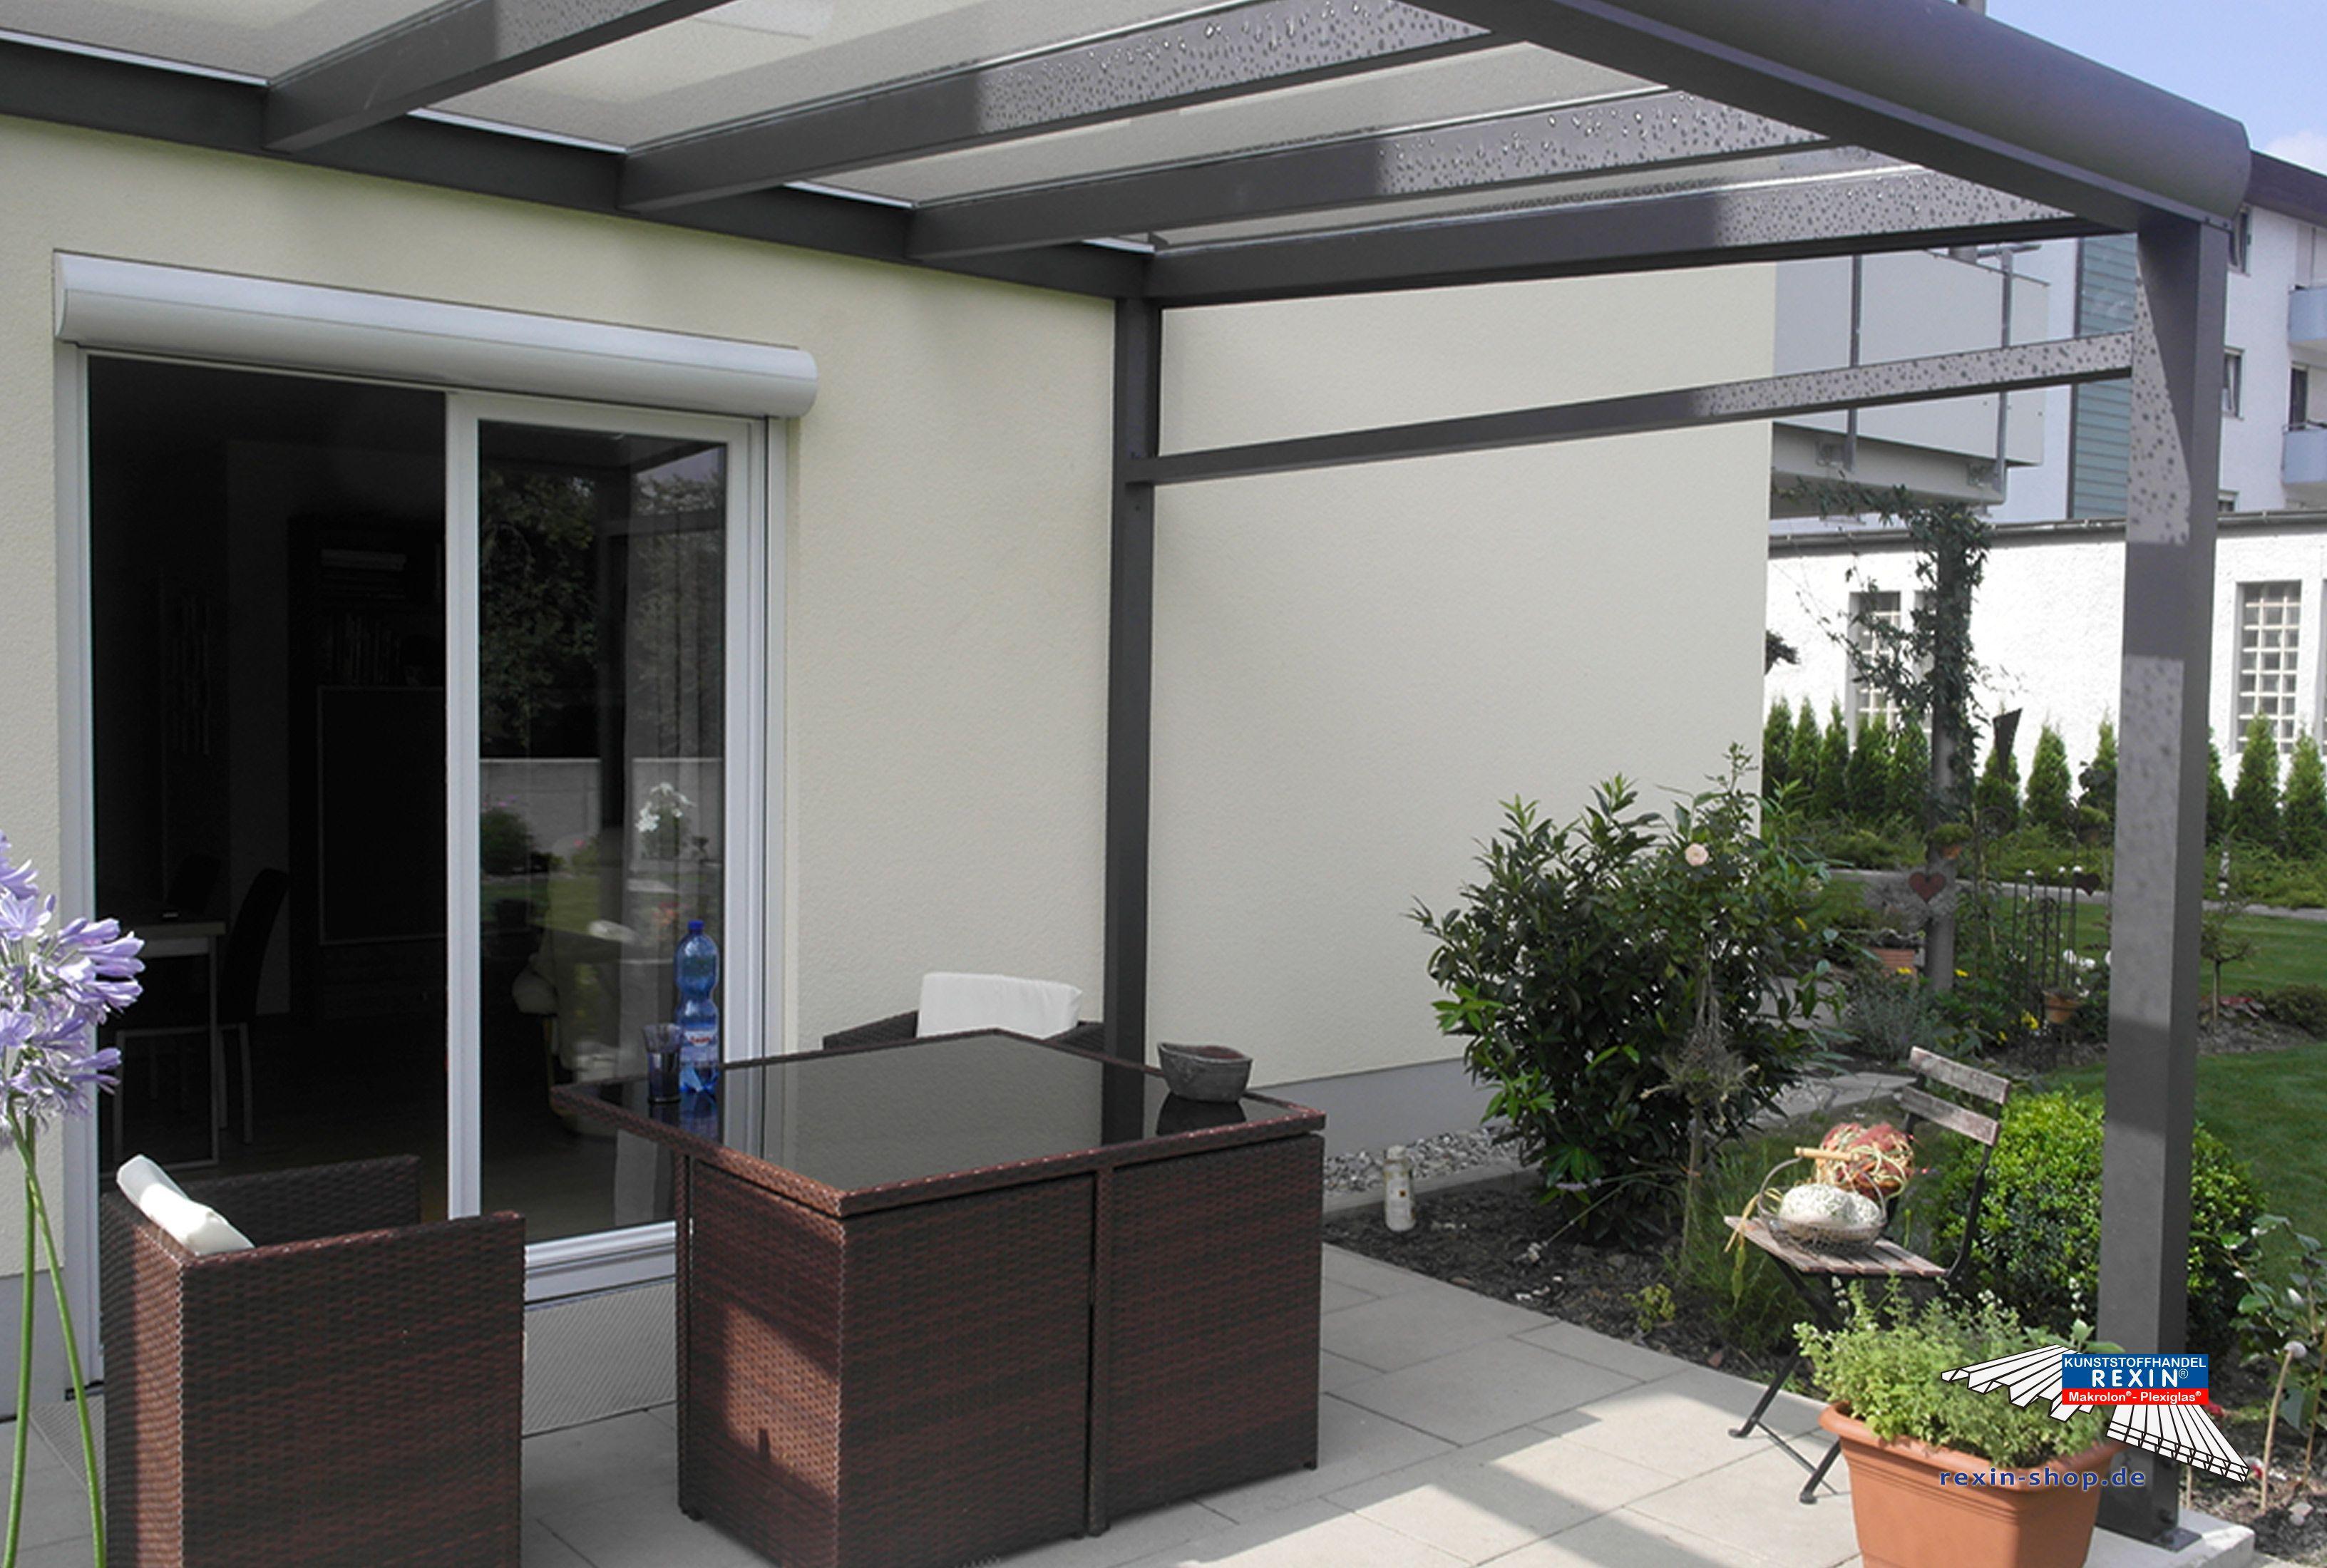 markise 5m x 4m elegant angerer x cm with markise 5m x 4m affordable sunfun beigegrau breite m. Black Bedroom Furniture Sets. Home Design Ideas